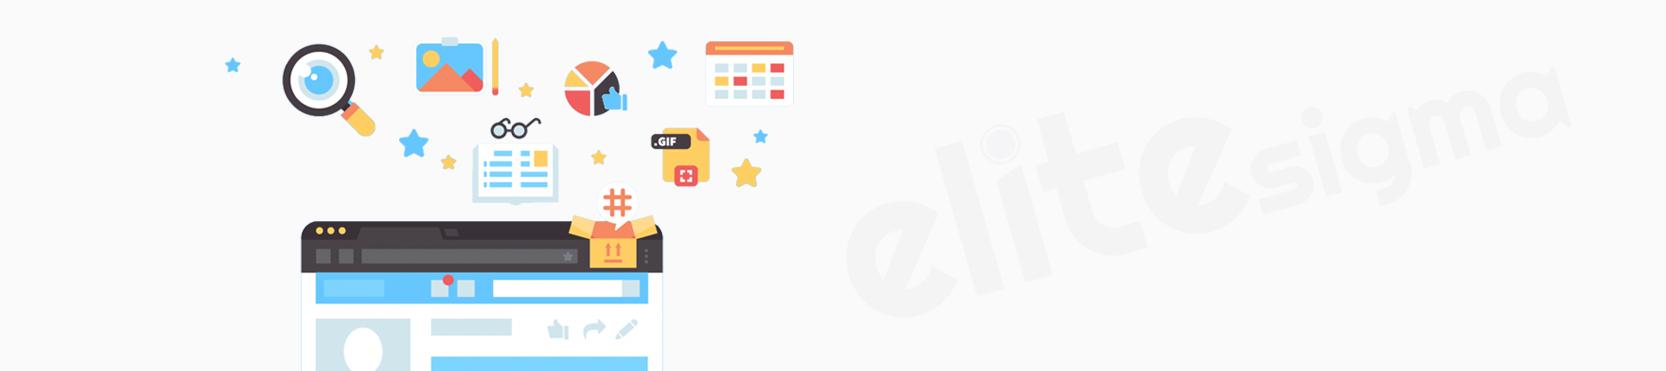 Chrome Extension Development Company | Chrome Extension